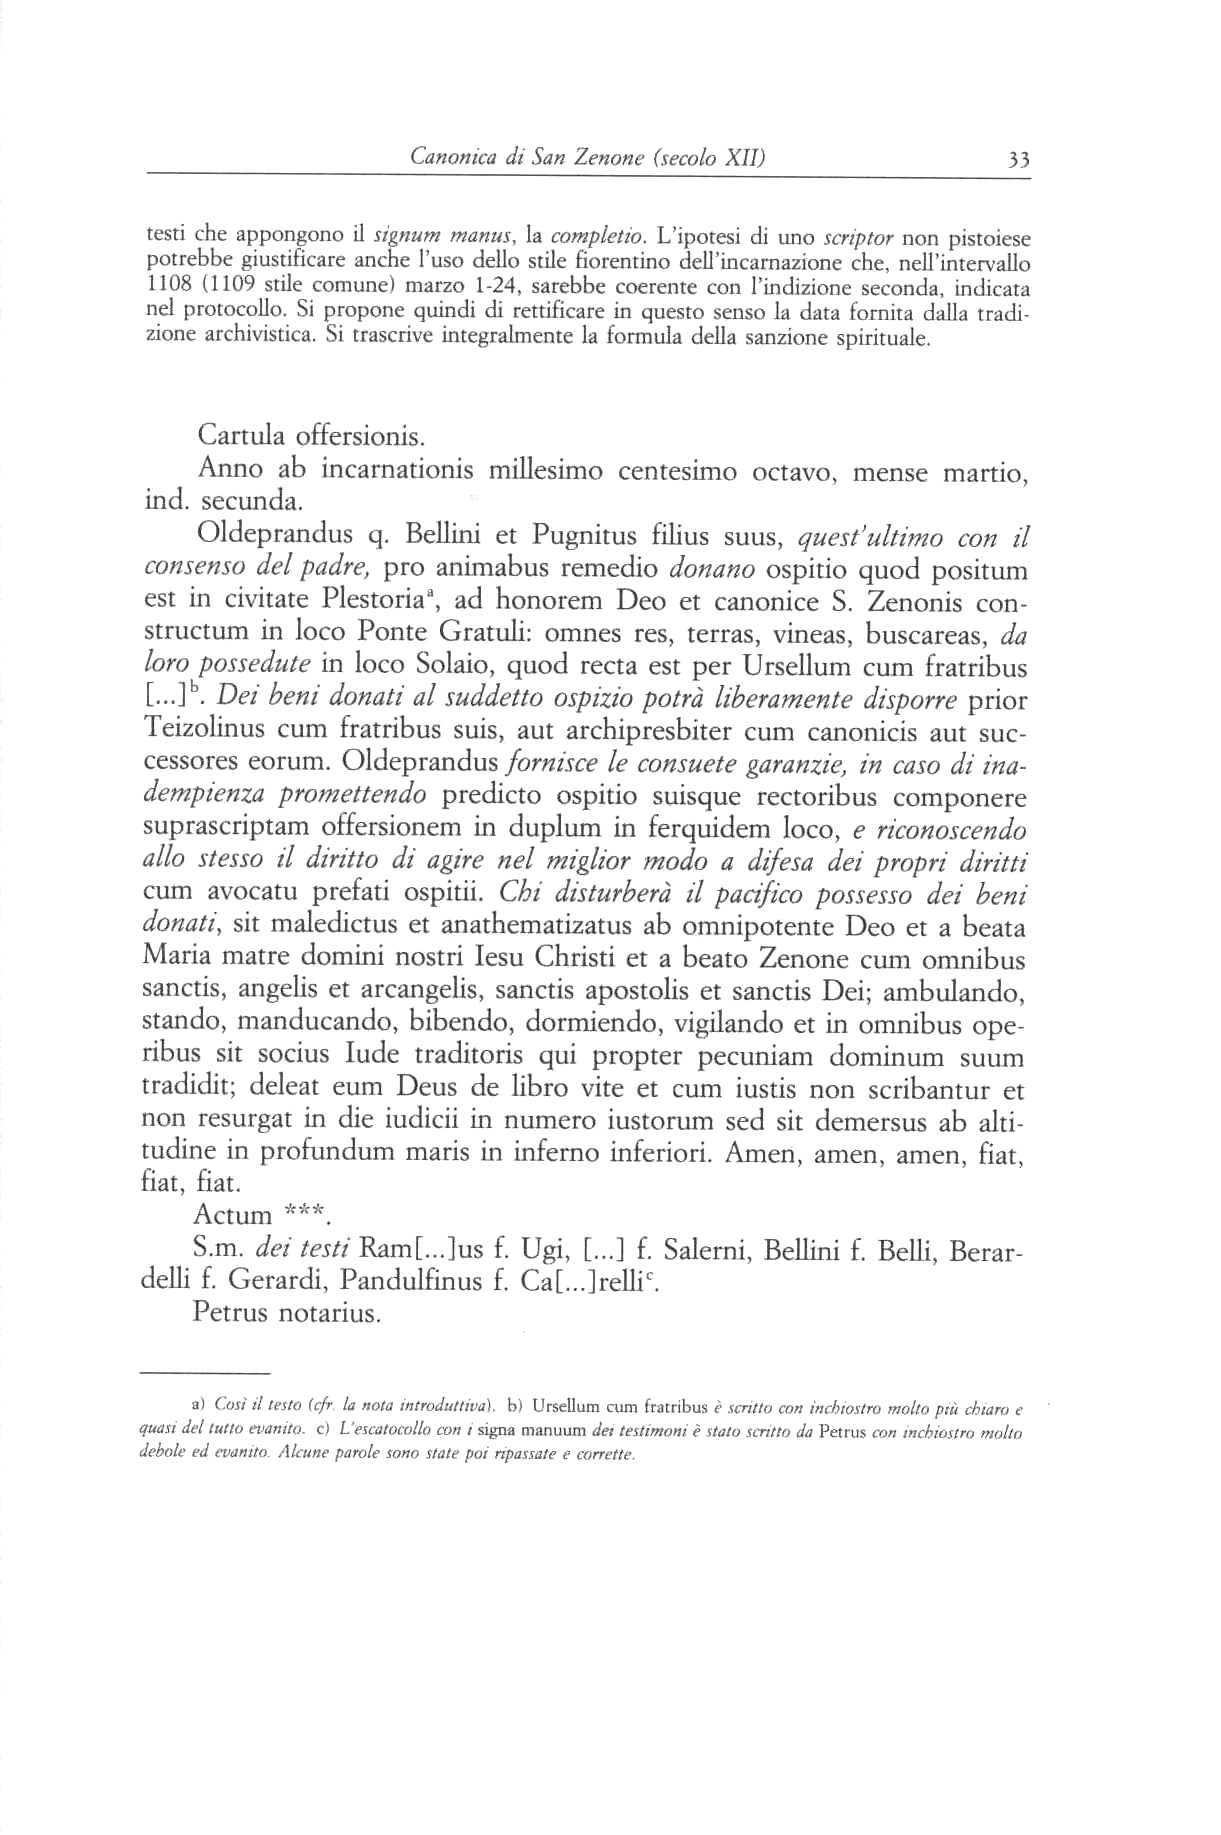 Canonica S. Zenone XII 0033.jpg